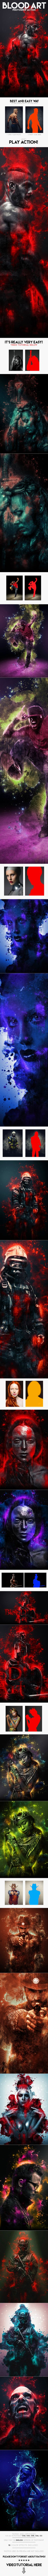 Blood Art Photoshop Action. Download here: http://graphicriver.net/item/blood-art-photoshop-action/16607276?ref=ksioks